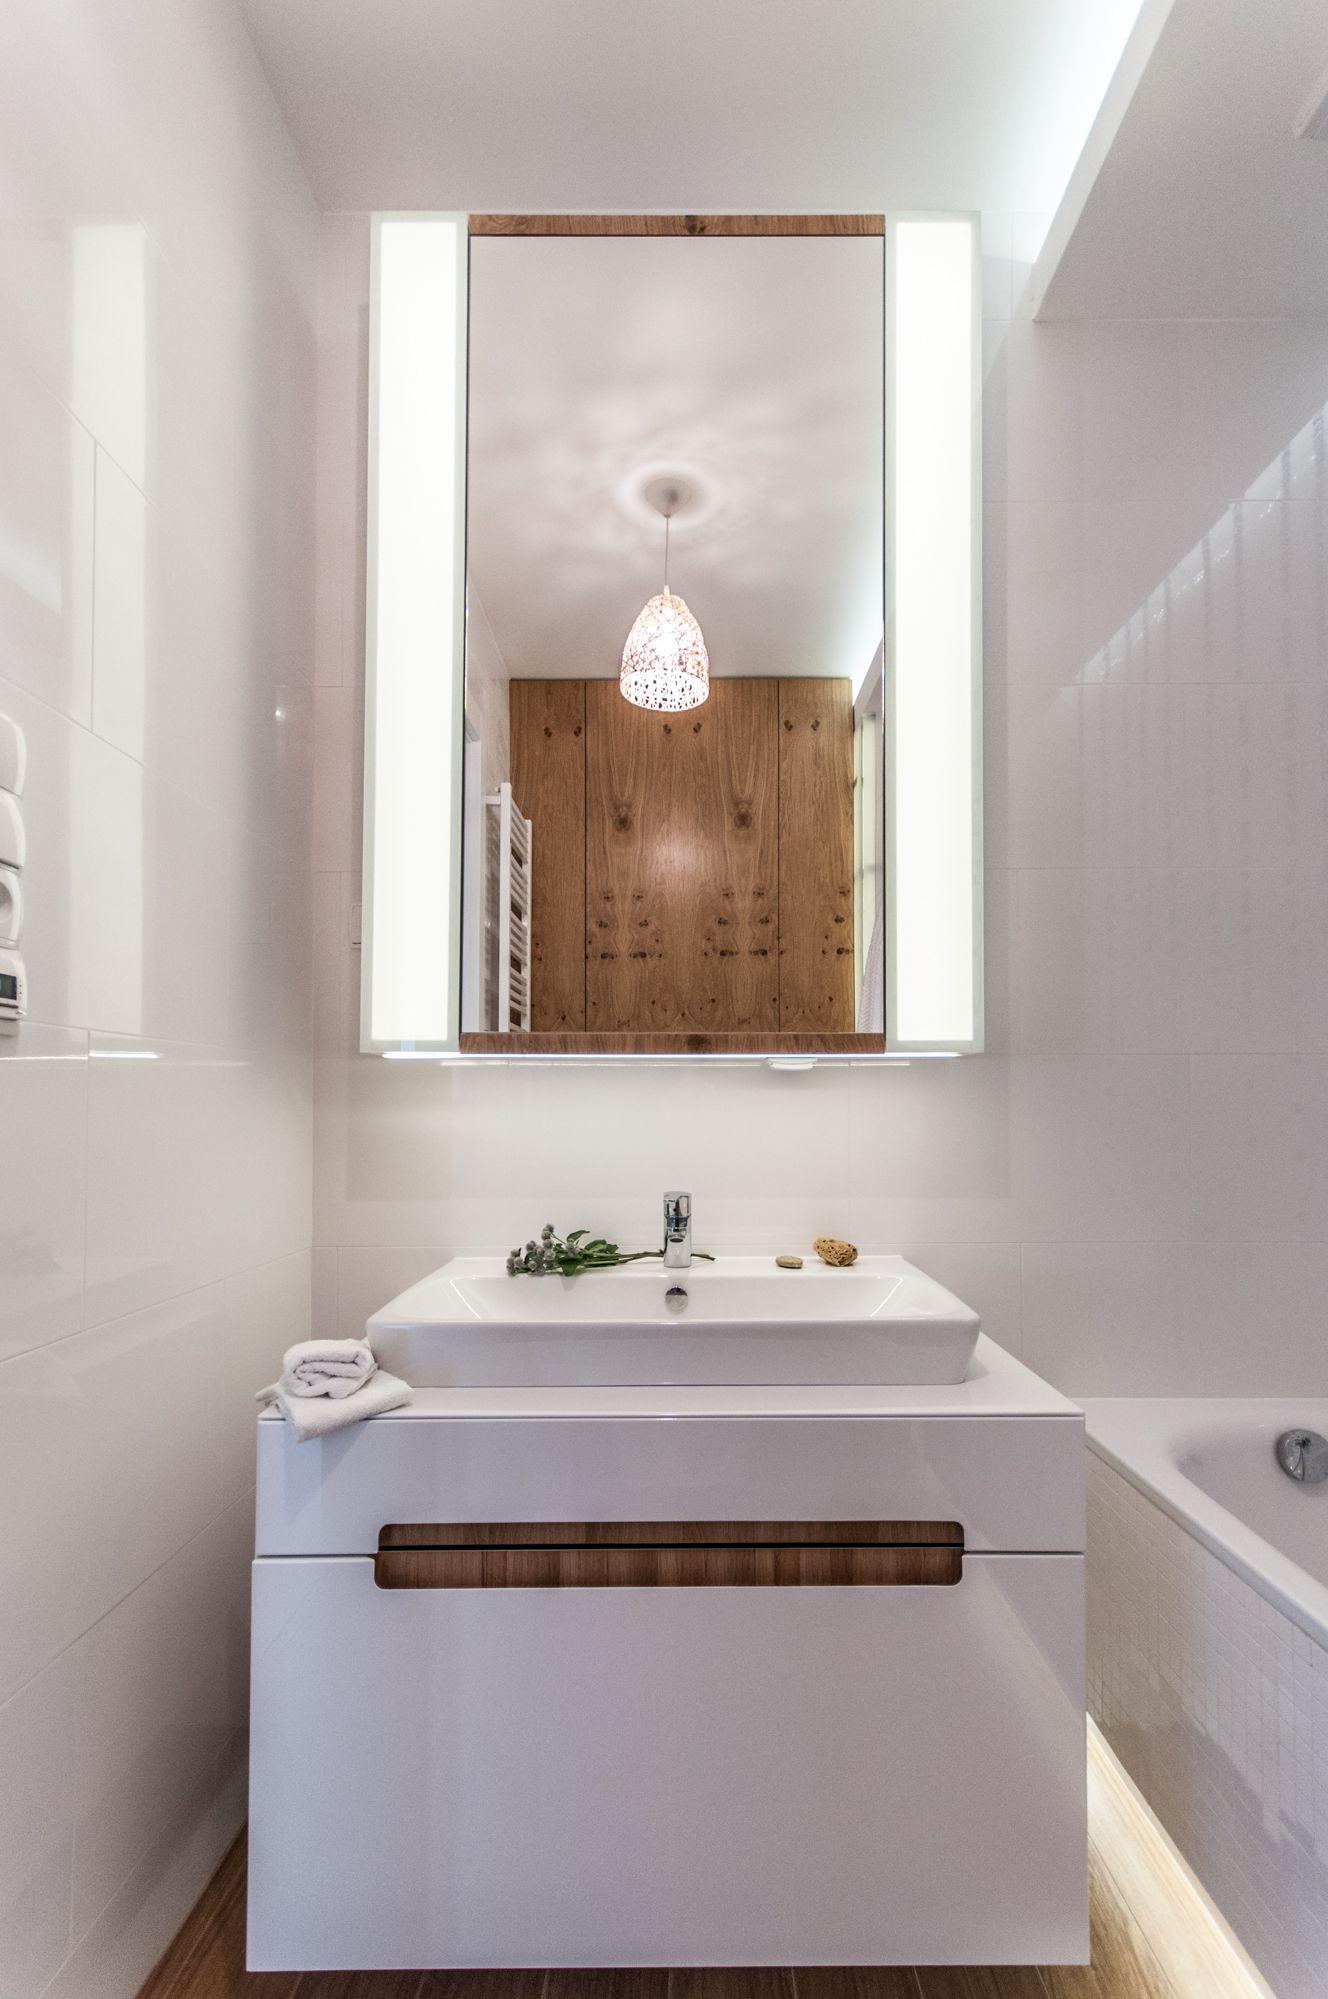 Otwarta kuchnia w bieli hola design homesquare - Bia A Azienka Ocieplona Drewnem